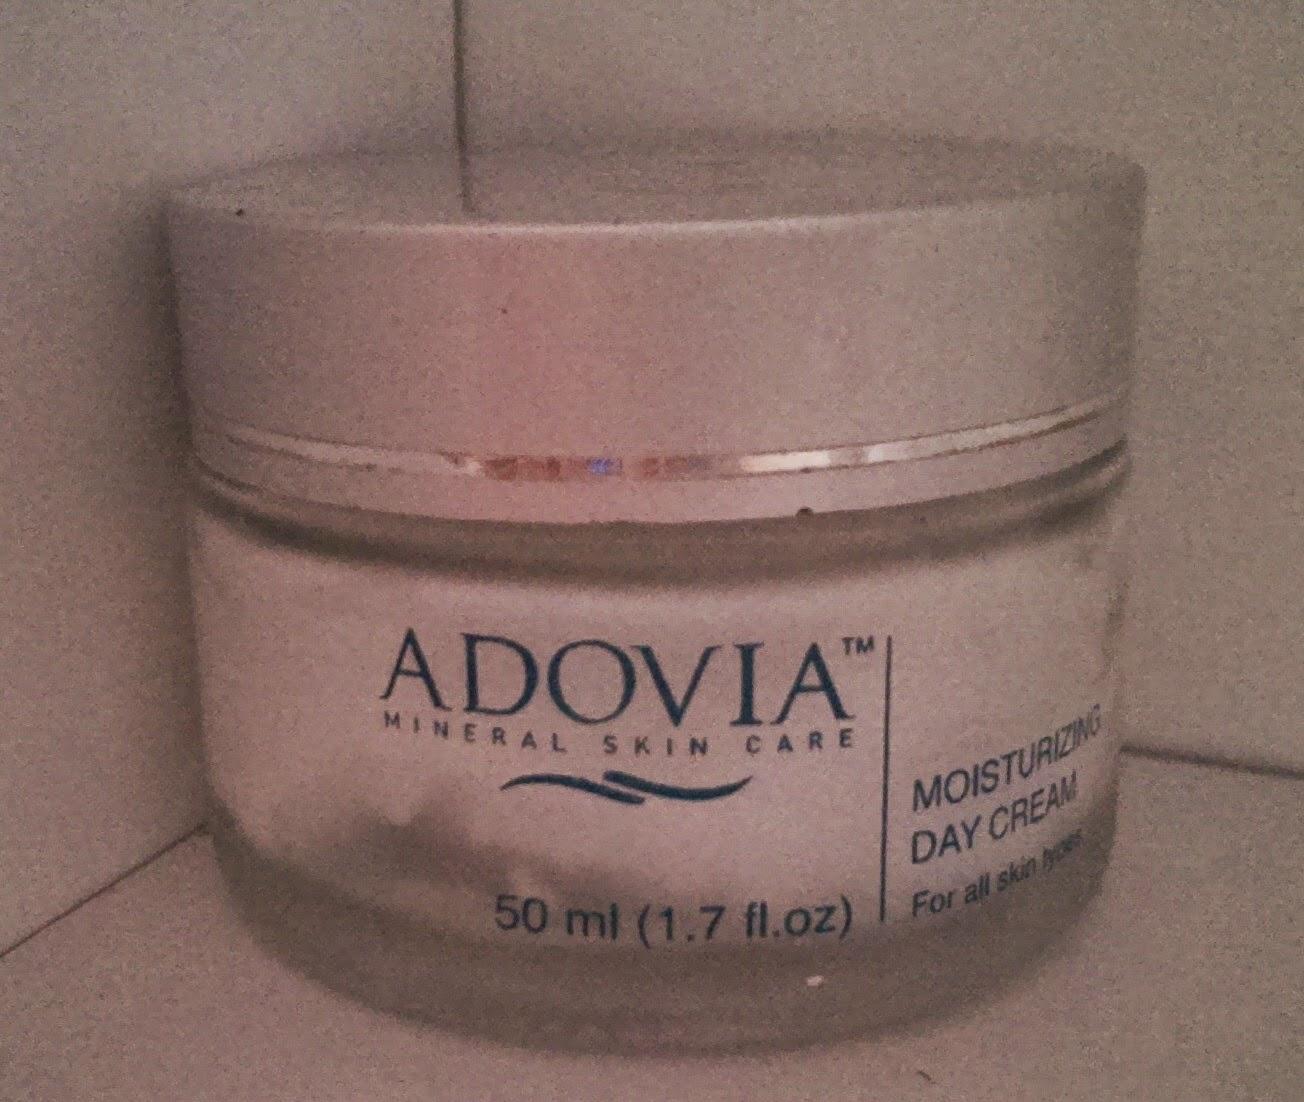 moisturizing%2Bday%2Bcream Natural Facial Moisturizer Review #moisturizer - Moisturizer For The Face